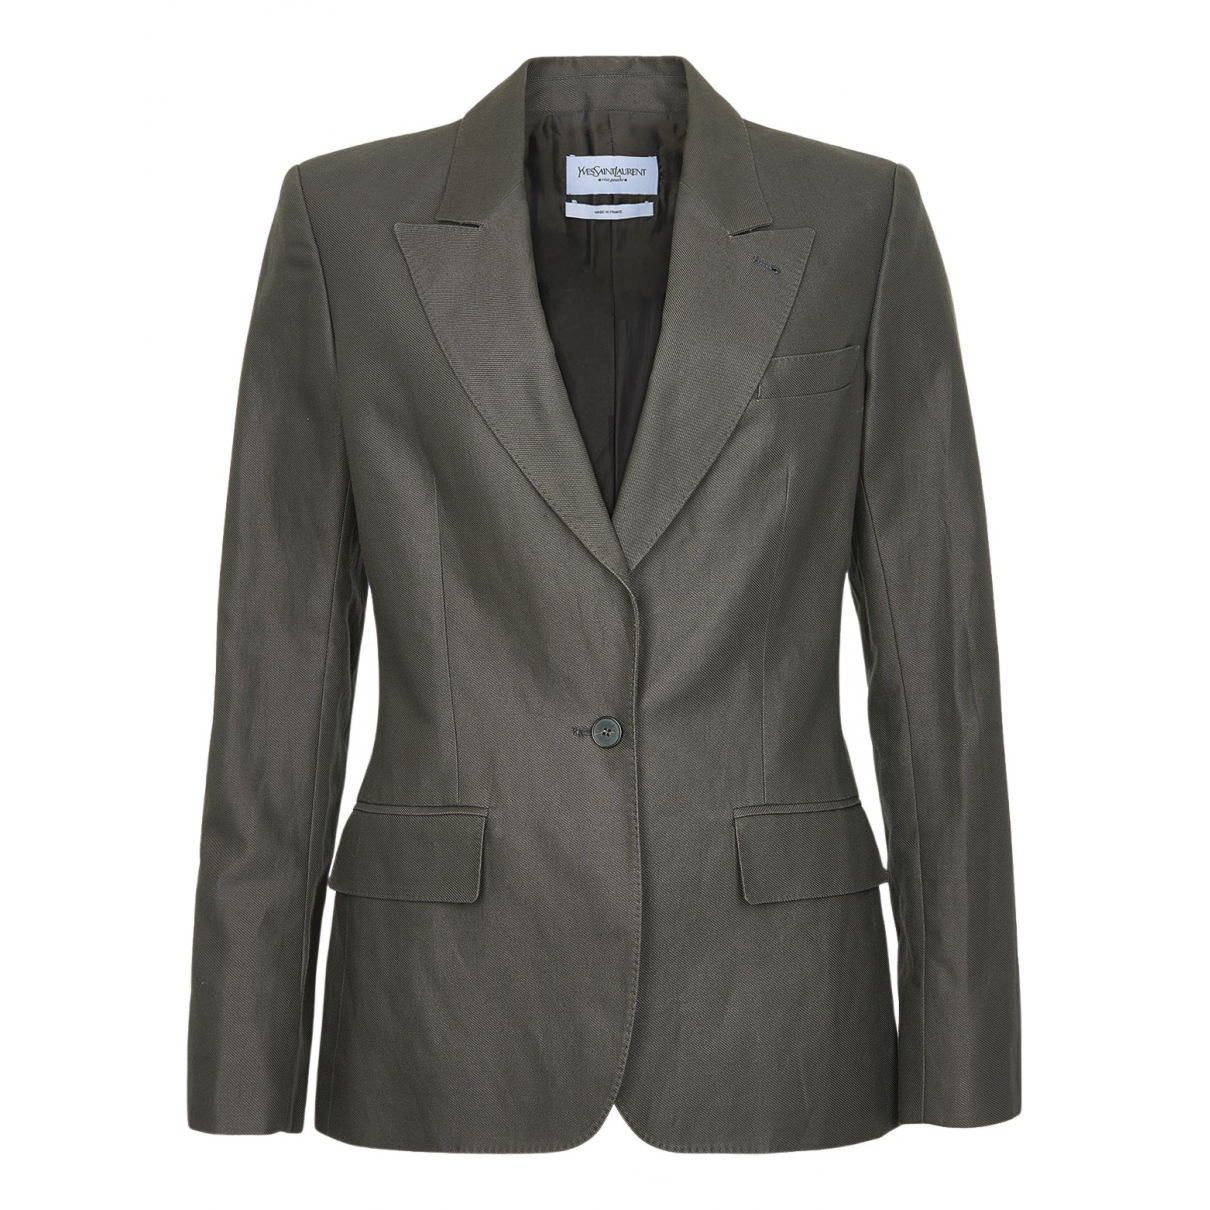 Yves Saint Laurent N Multicolour Cotton jacket for Women 12 UK